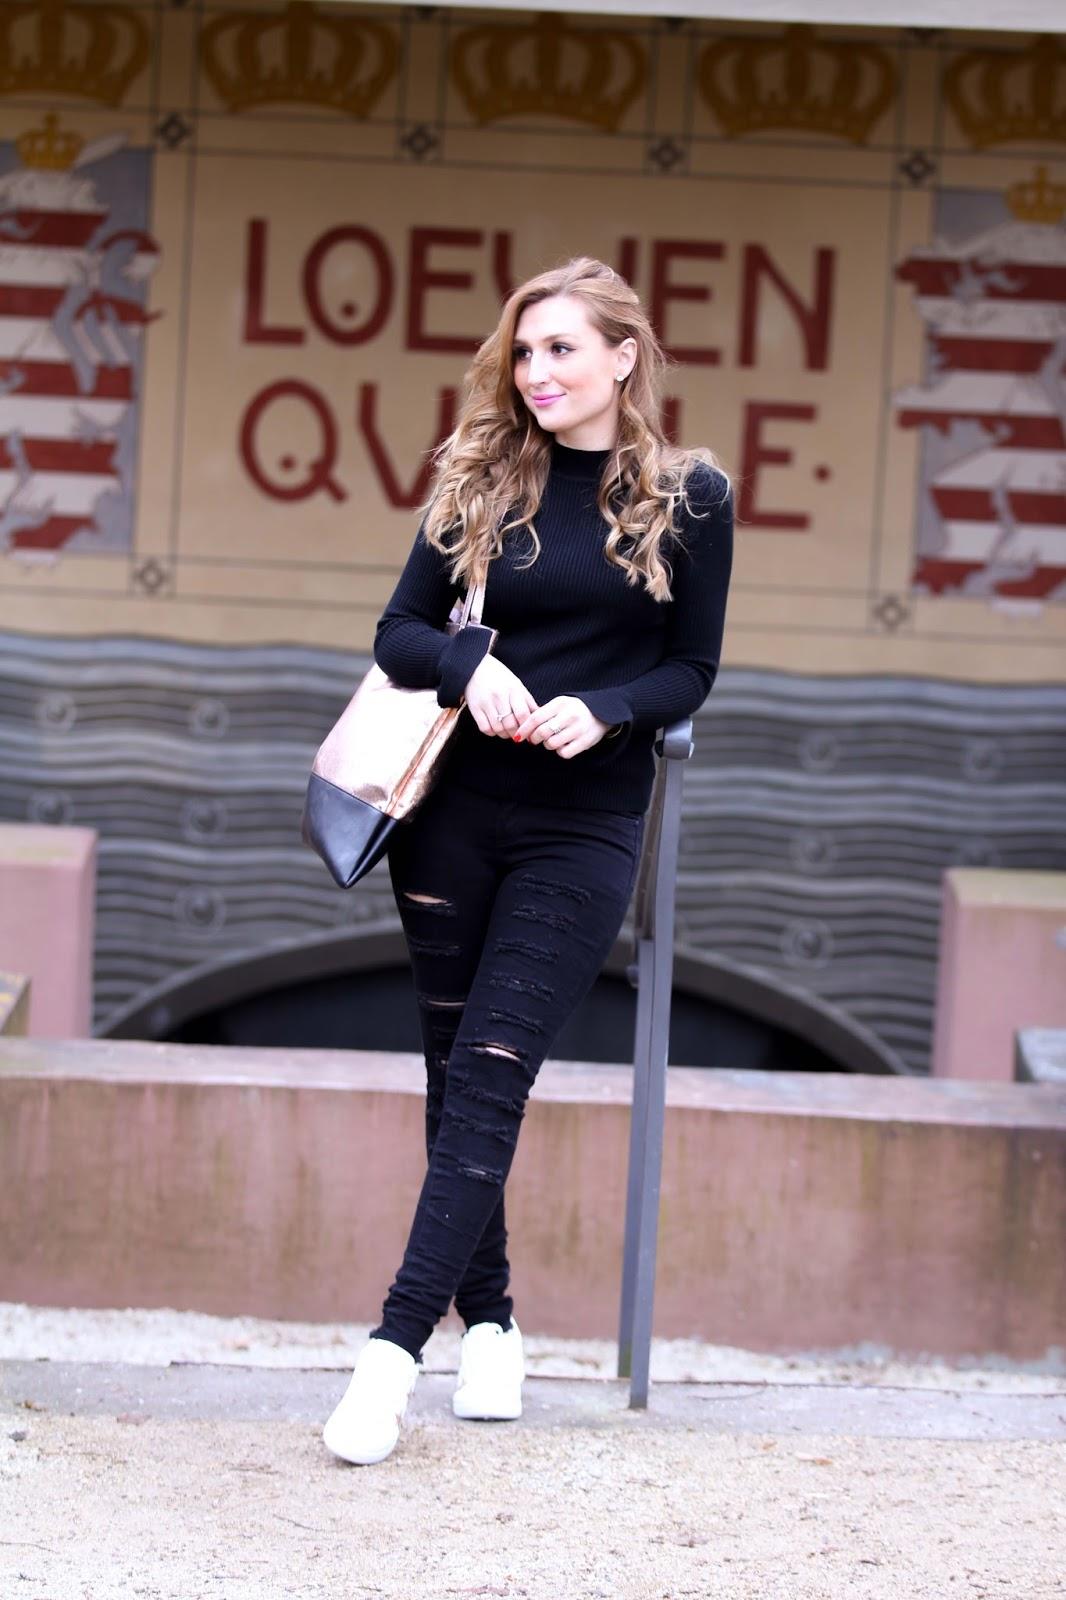 styleblogger-lifestyleblogger-outdoorblogger-streetstyleblogger-sneaker-mit-sternen